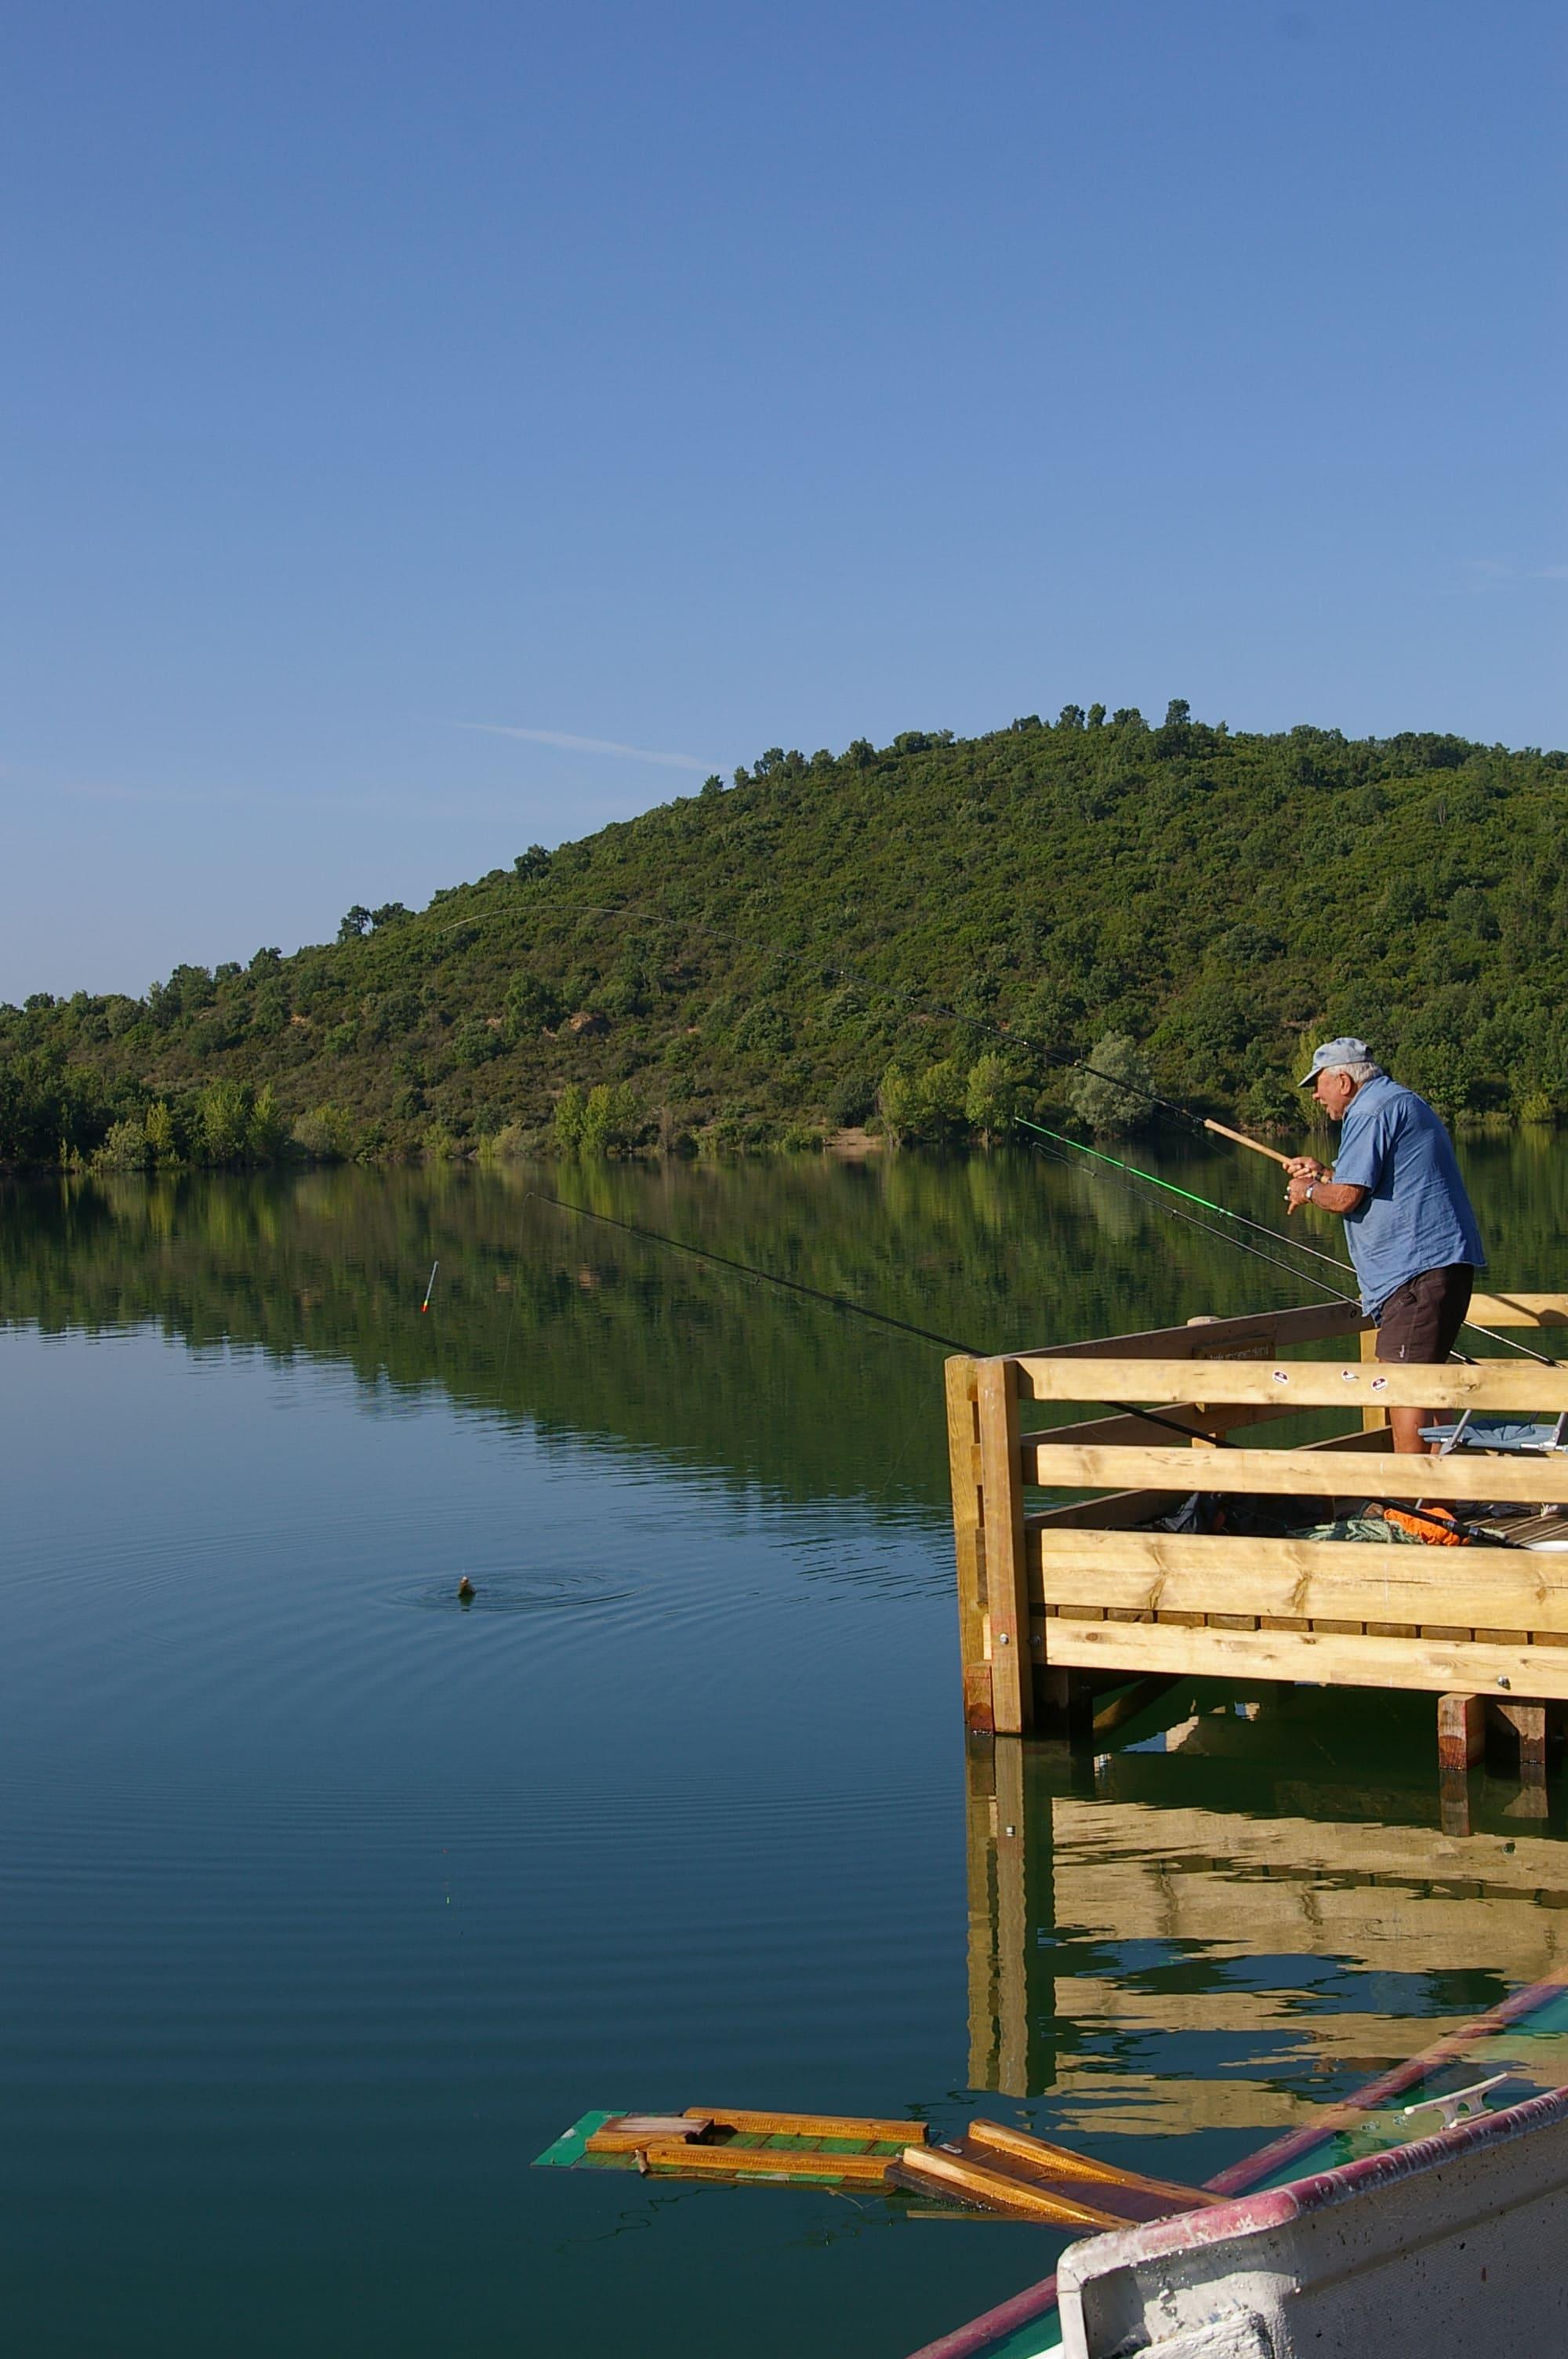 ponton handi-pêche